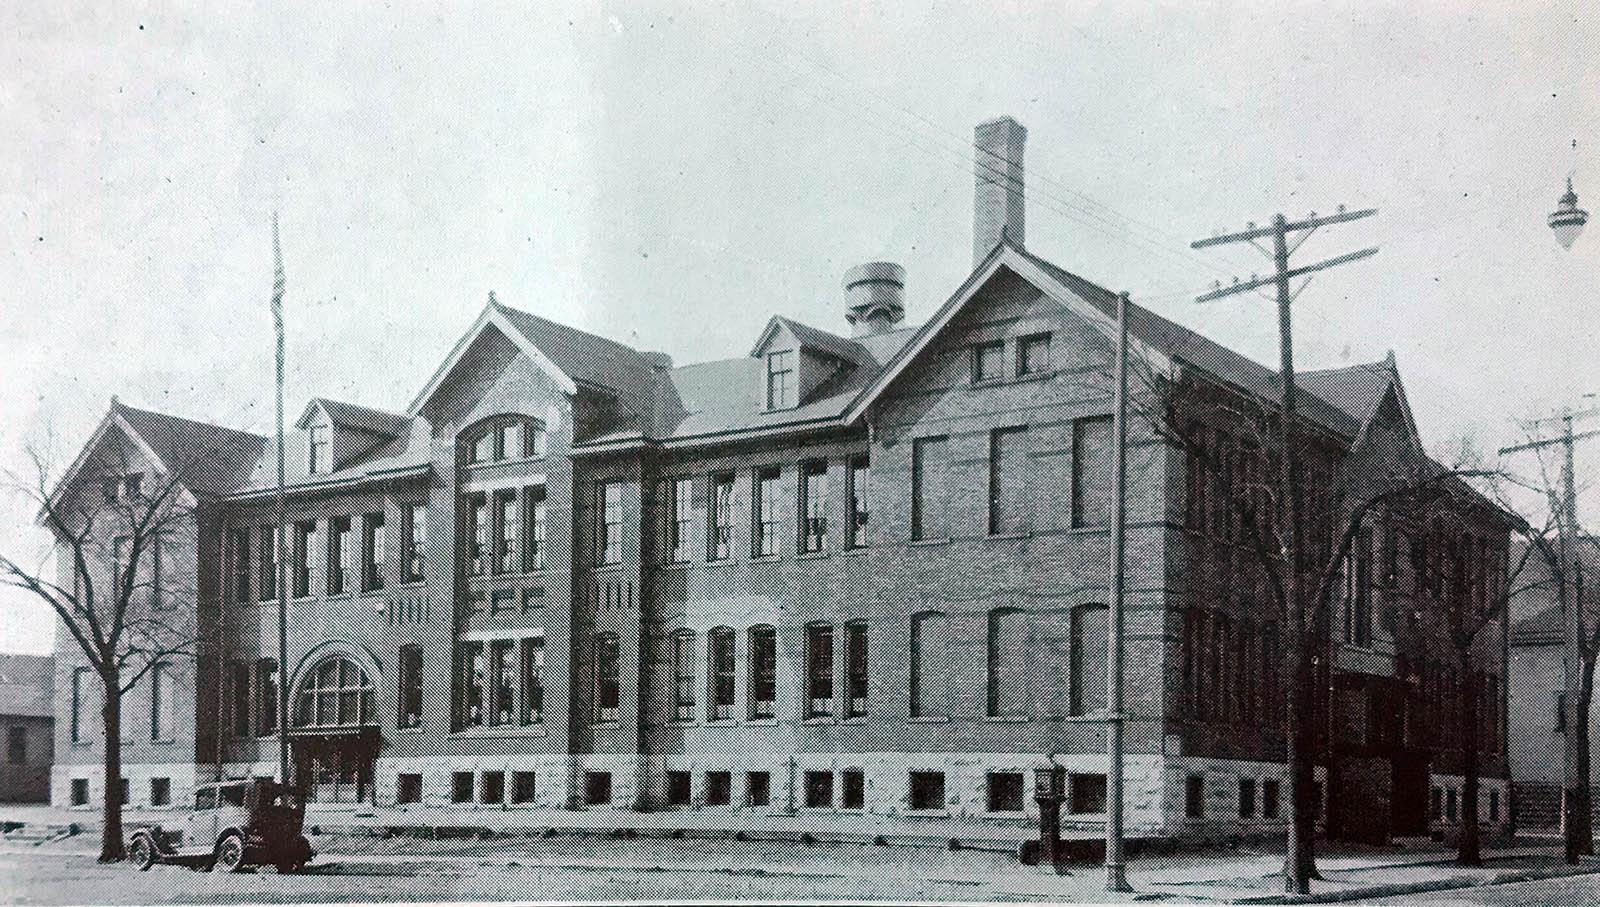 Island Avenue School